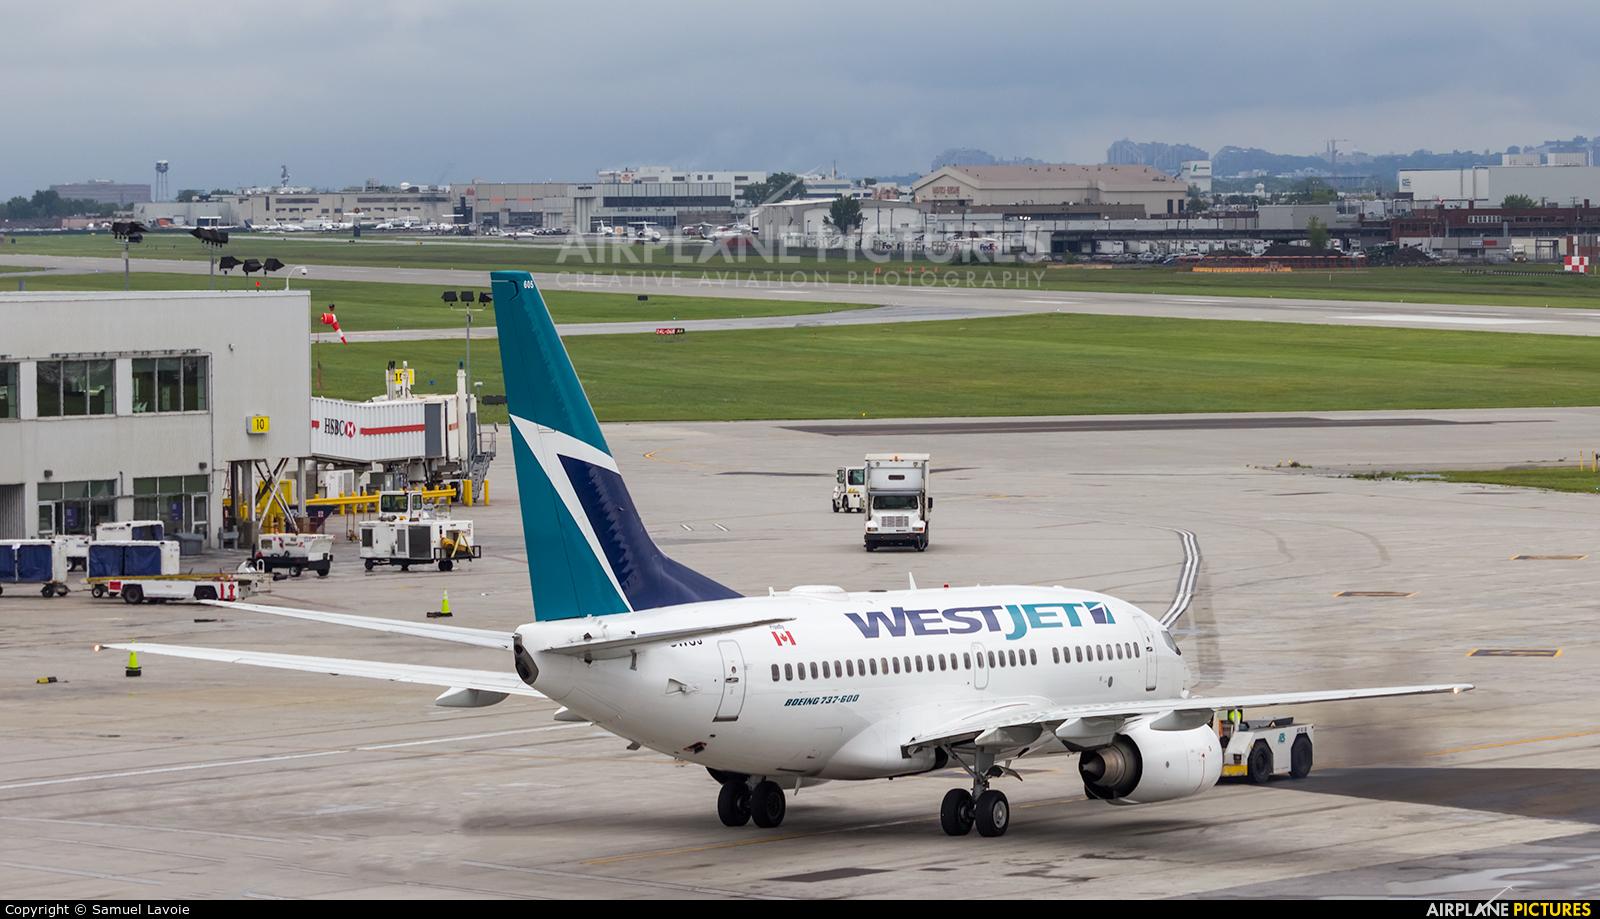 WestJet Airlines C-GWSJ aircraft at Montreal - Pierre Elliott Trudeau Intl, QC